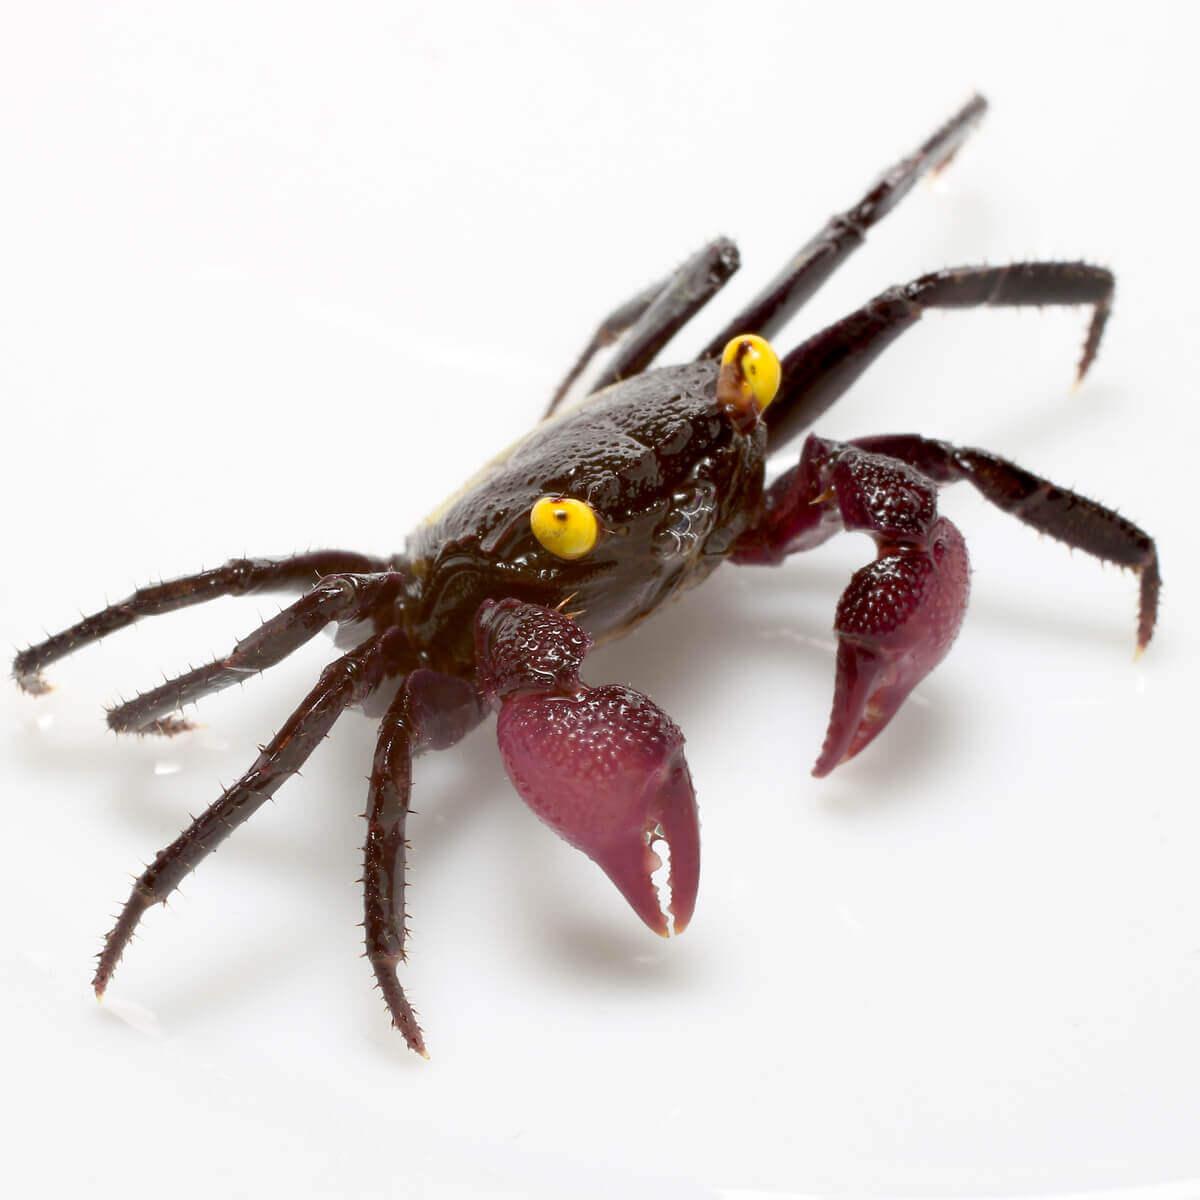 A close up of a vampire crab.